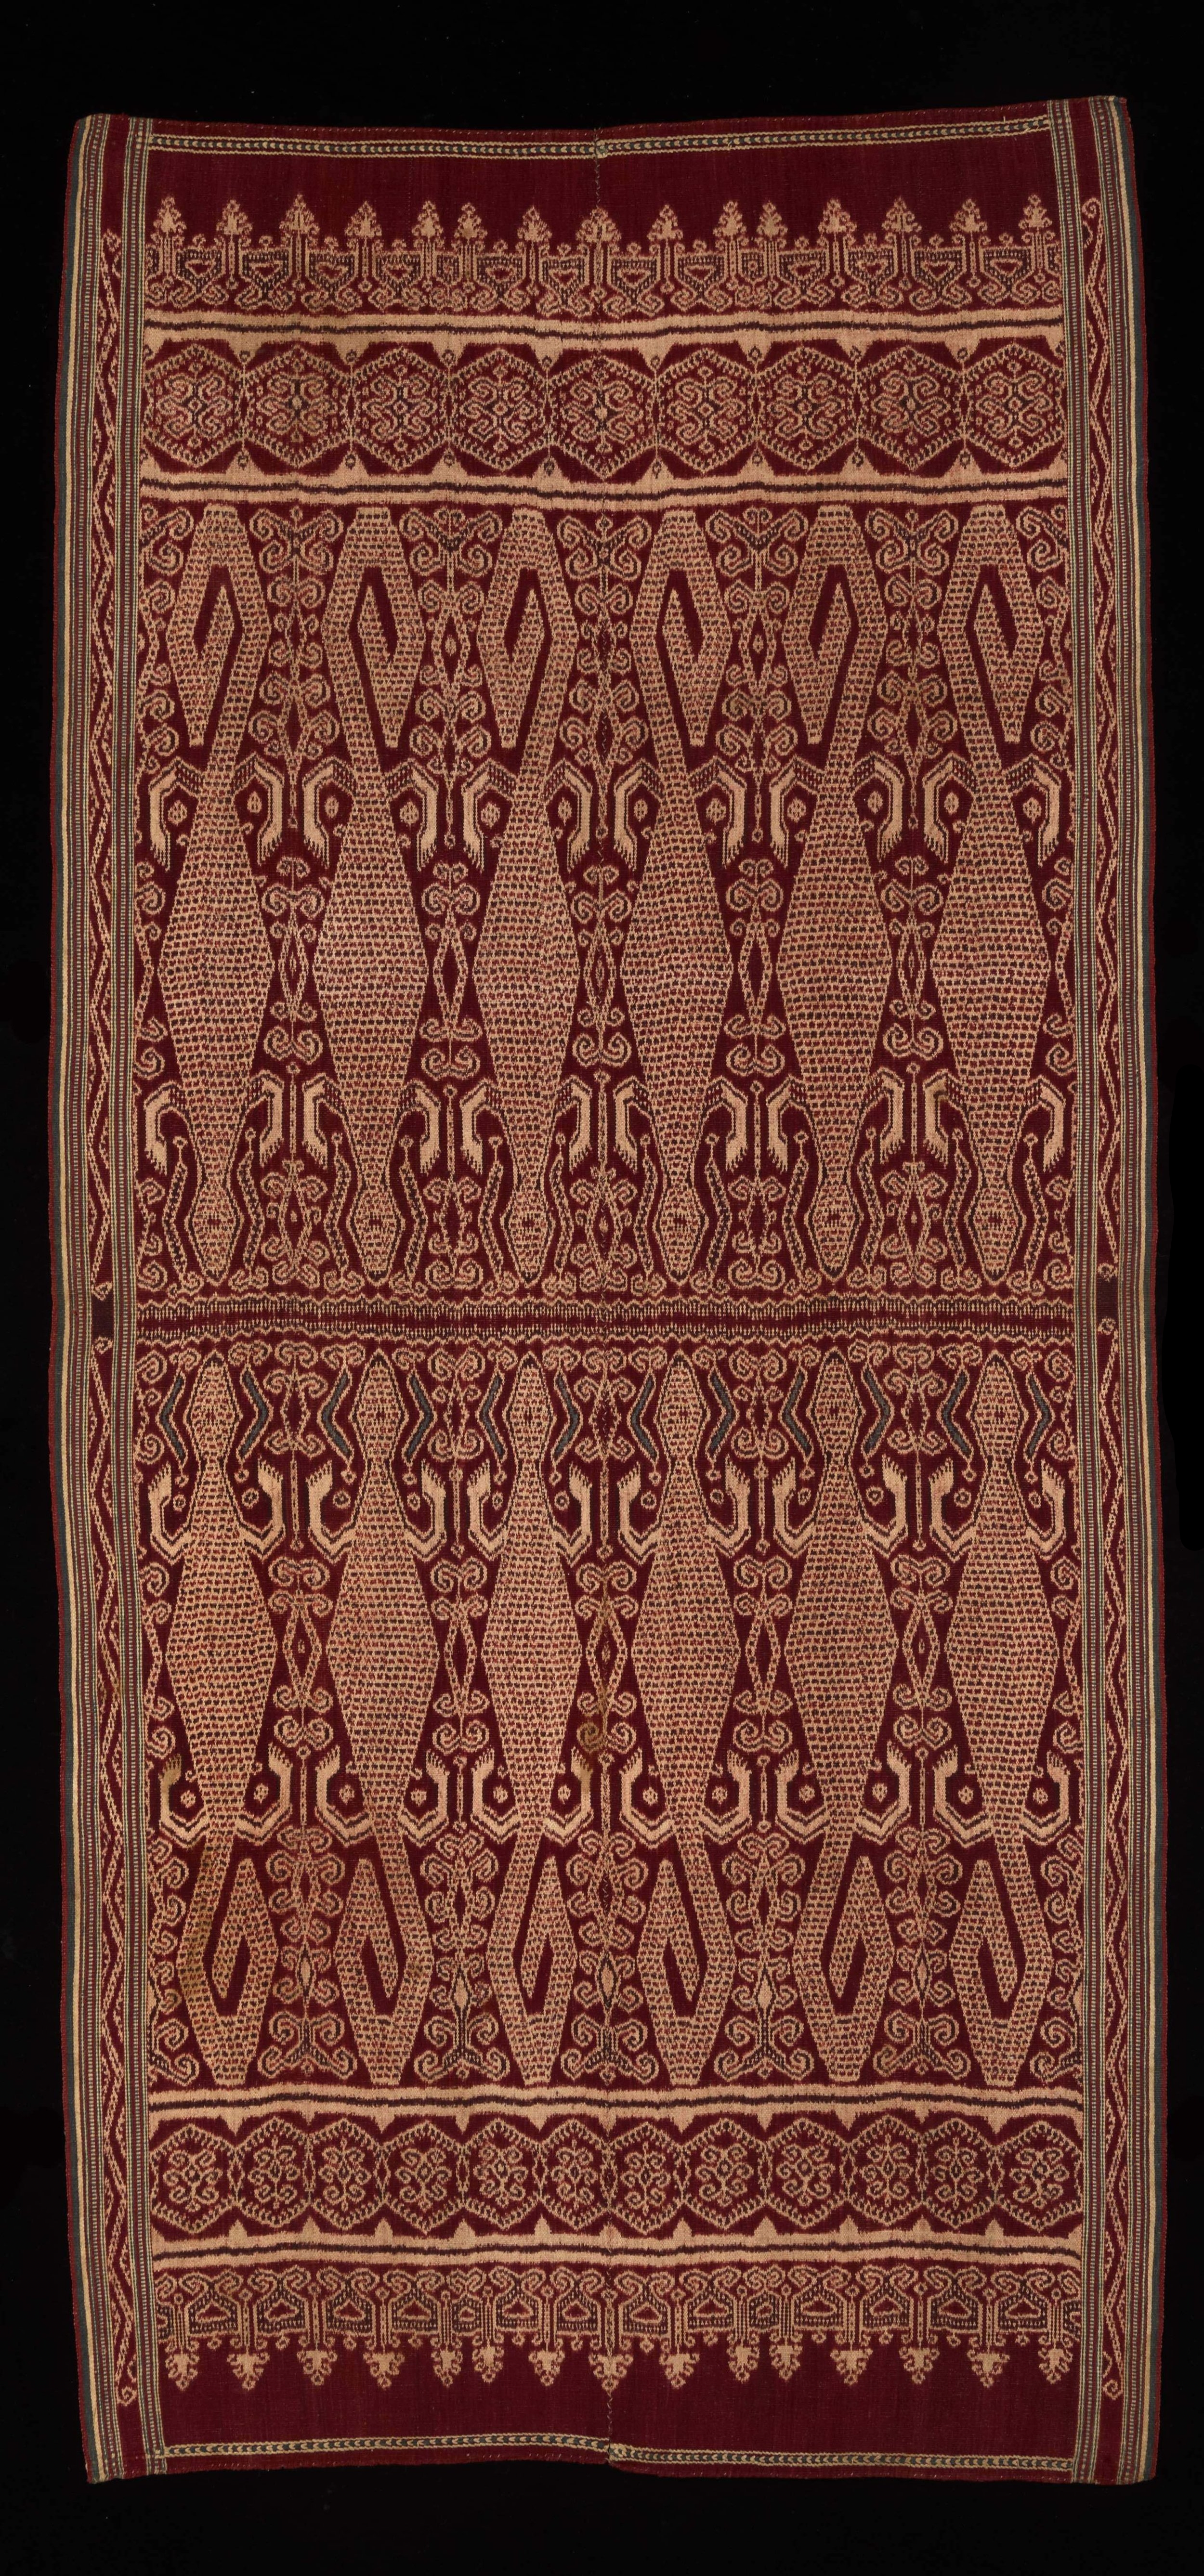 Iban  Ceremonial Weaving |  Pua Kumbu  © The Dallas Museum of Art | Texas, USA